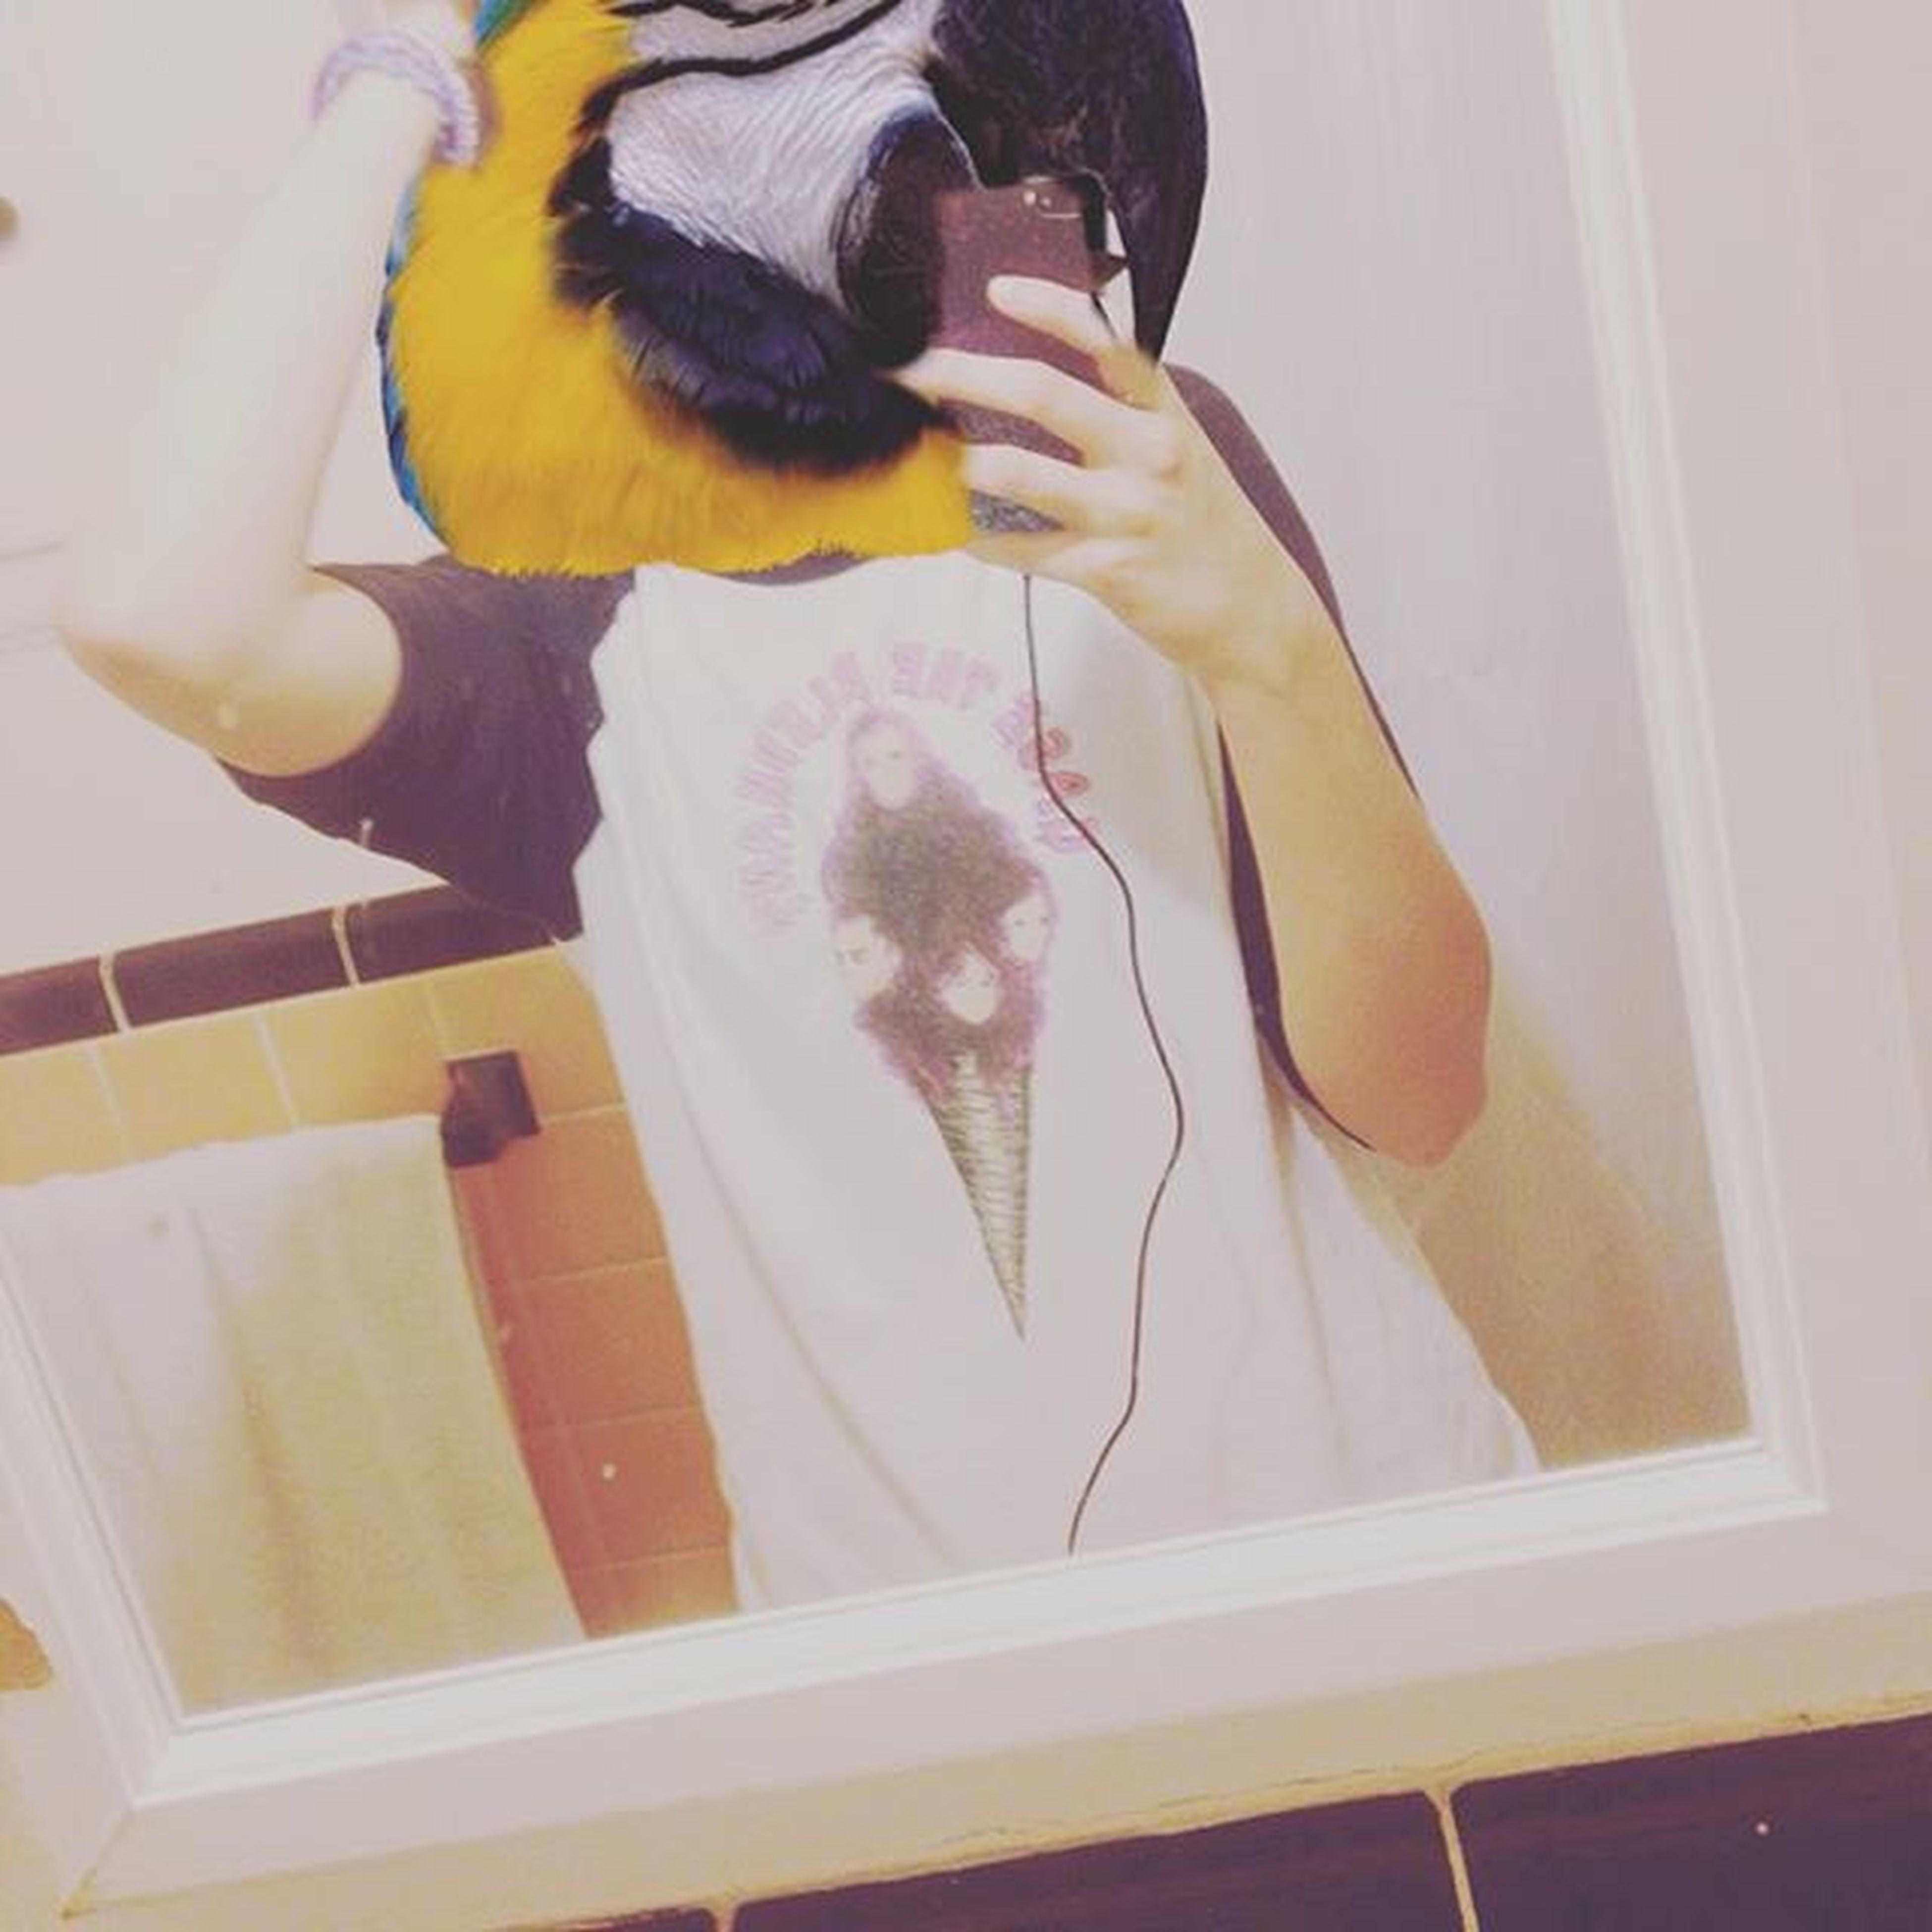 Polly wanna cracker? Mirror Mirrorselfie Mirrorselfie Parrot Bird Parrothead Cagethelephant Selfie Repost Edit Animalhead Animalheadapp